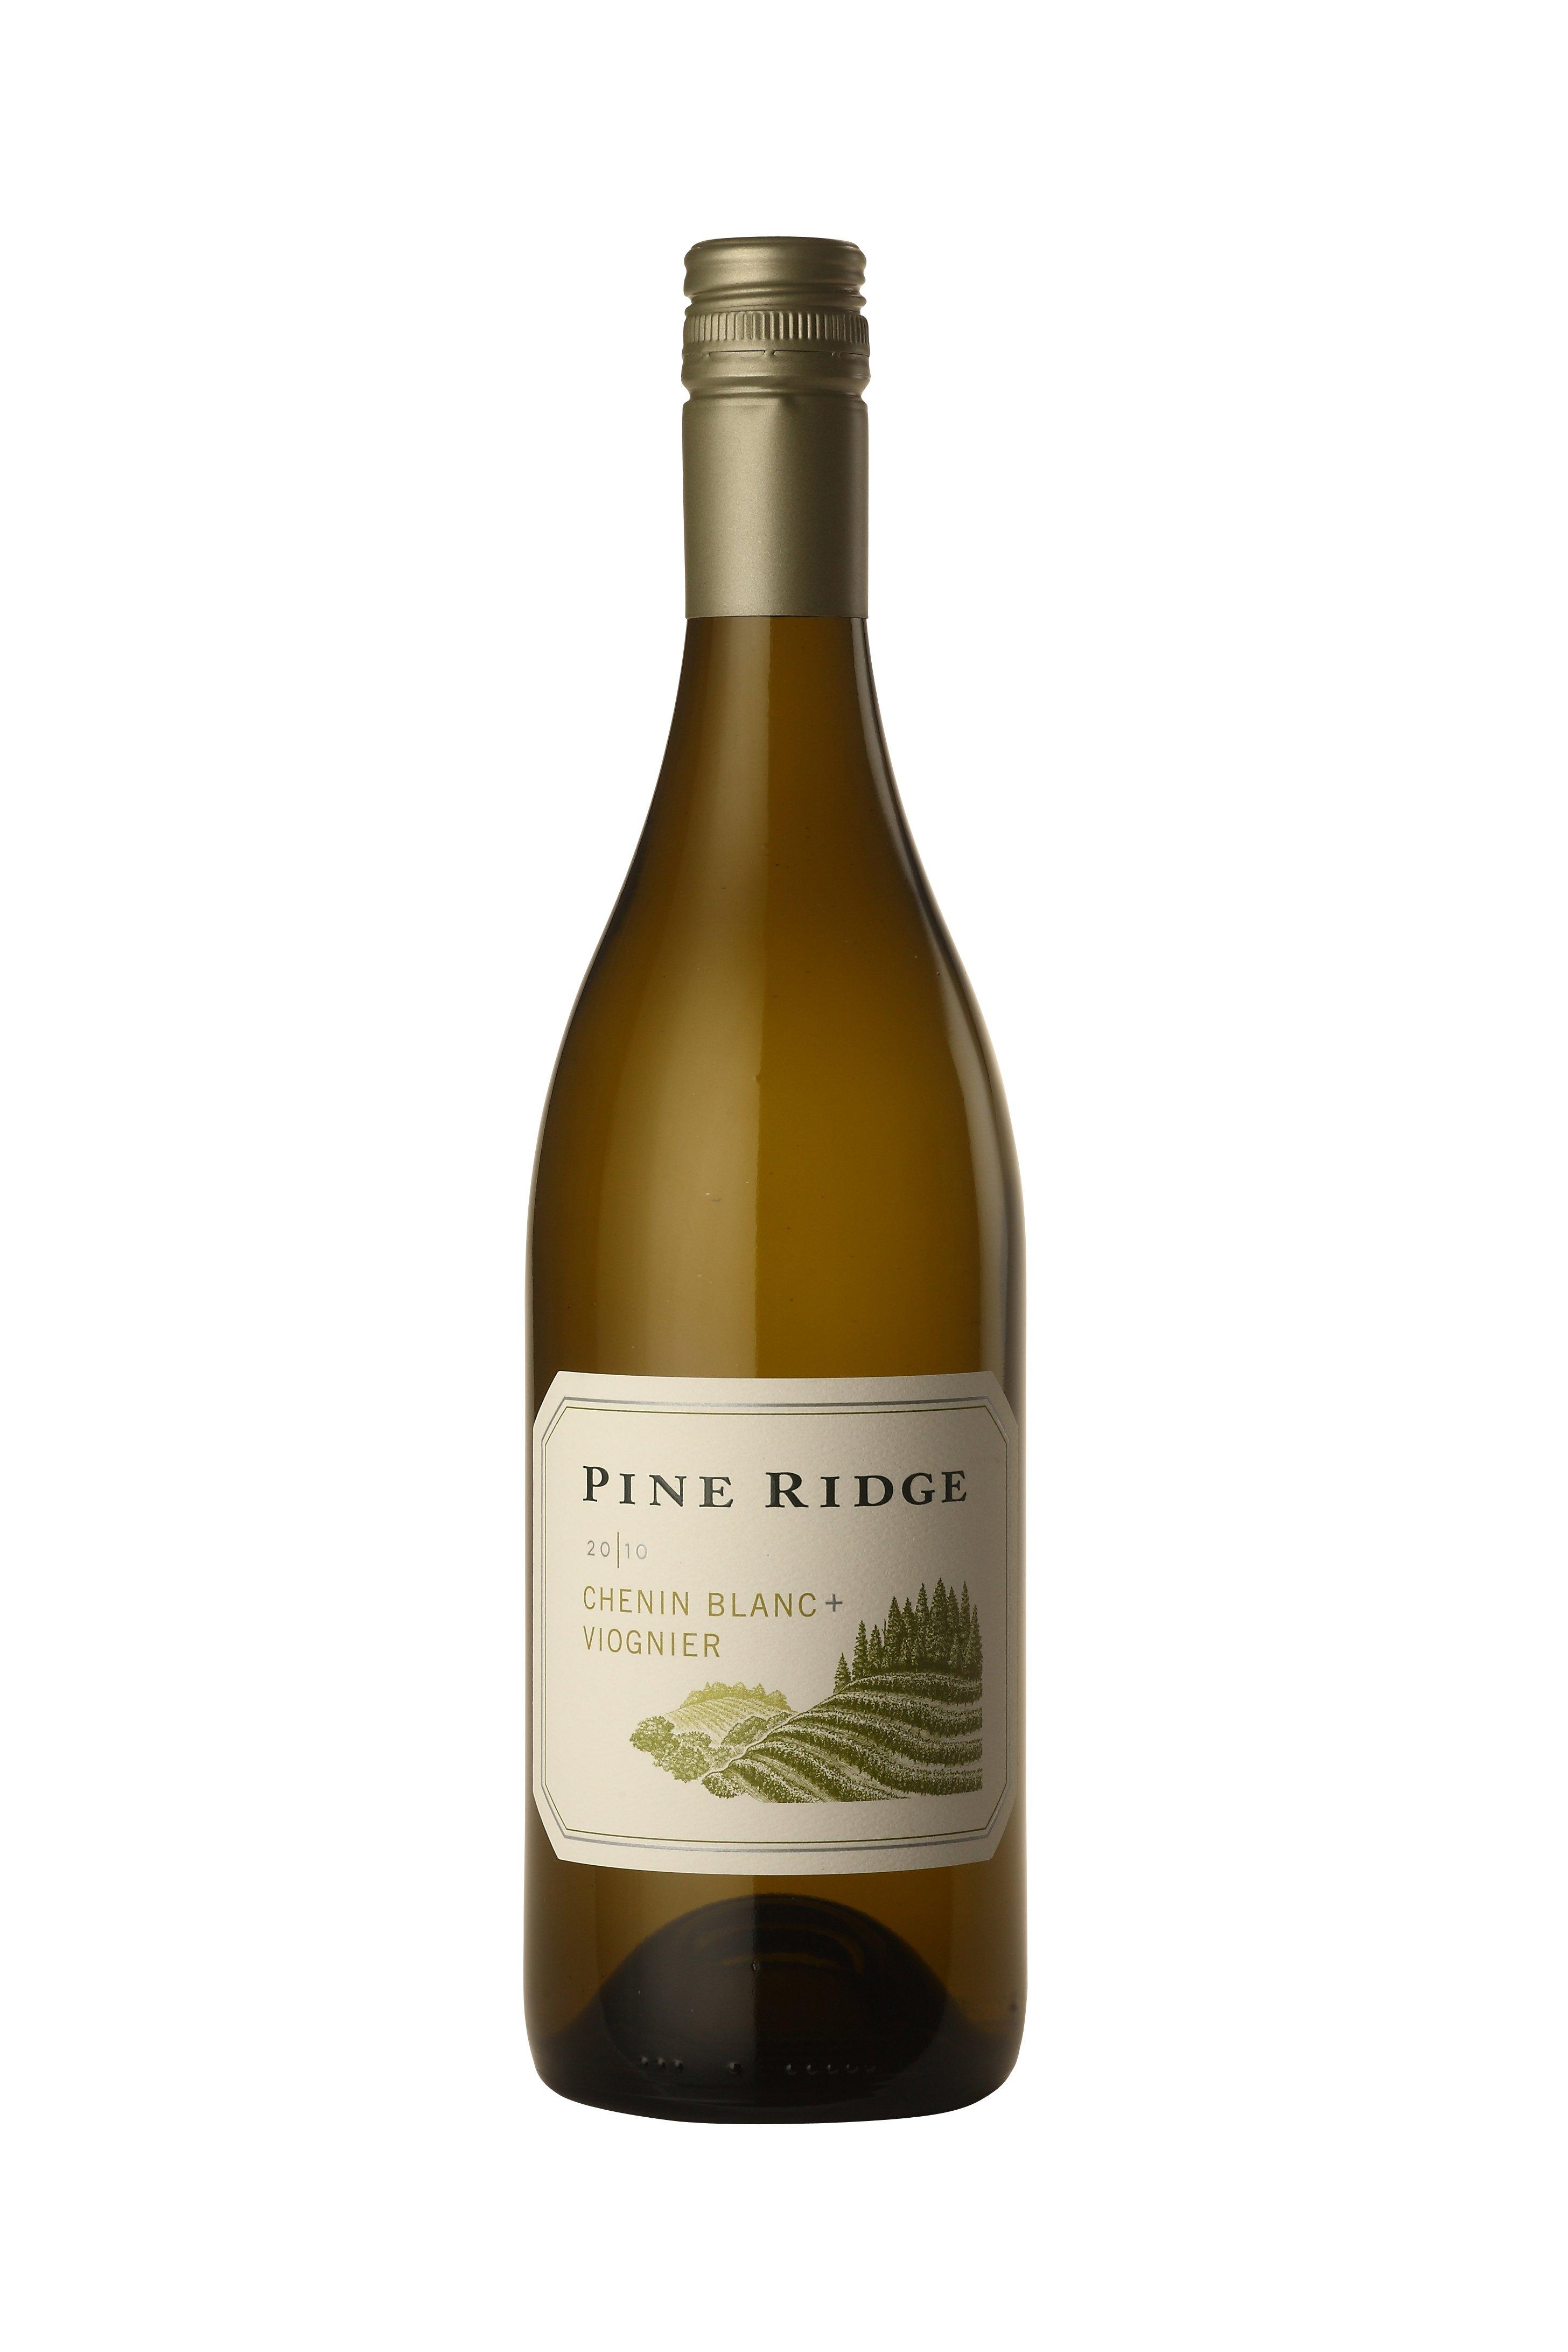 2010 Pine Ridge Chenin Blanc+Viognier California